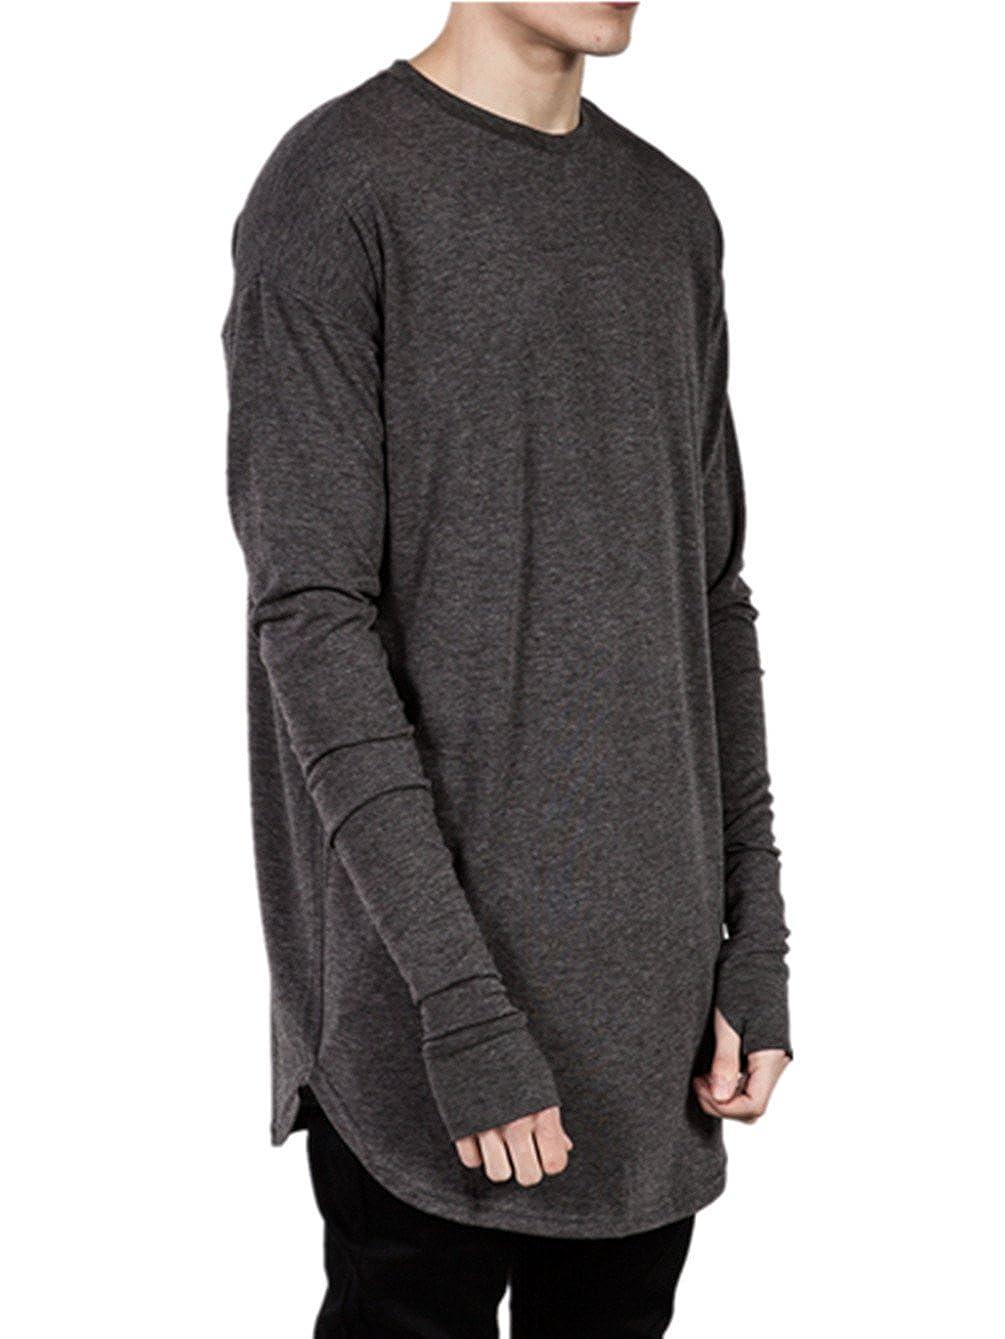 Q& Y Men's Cotton Thumb Hole Cuffs Long Sleeve T-Shirt Basic Tee